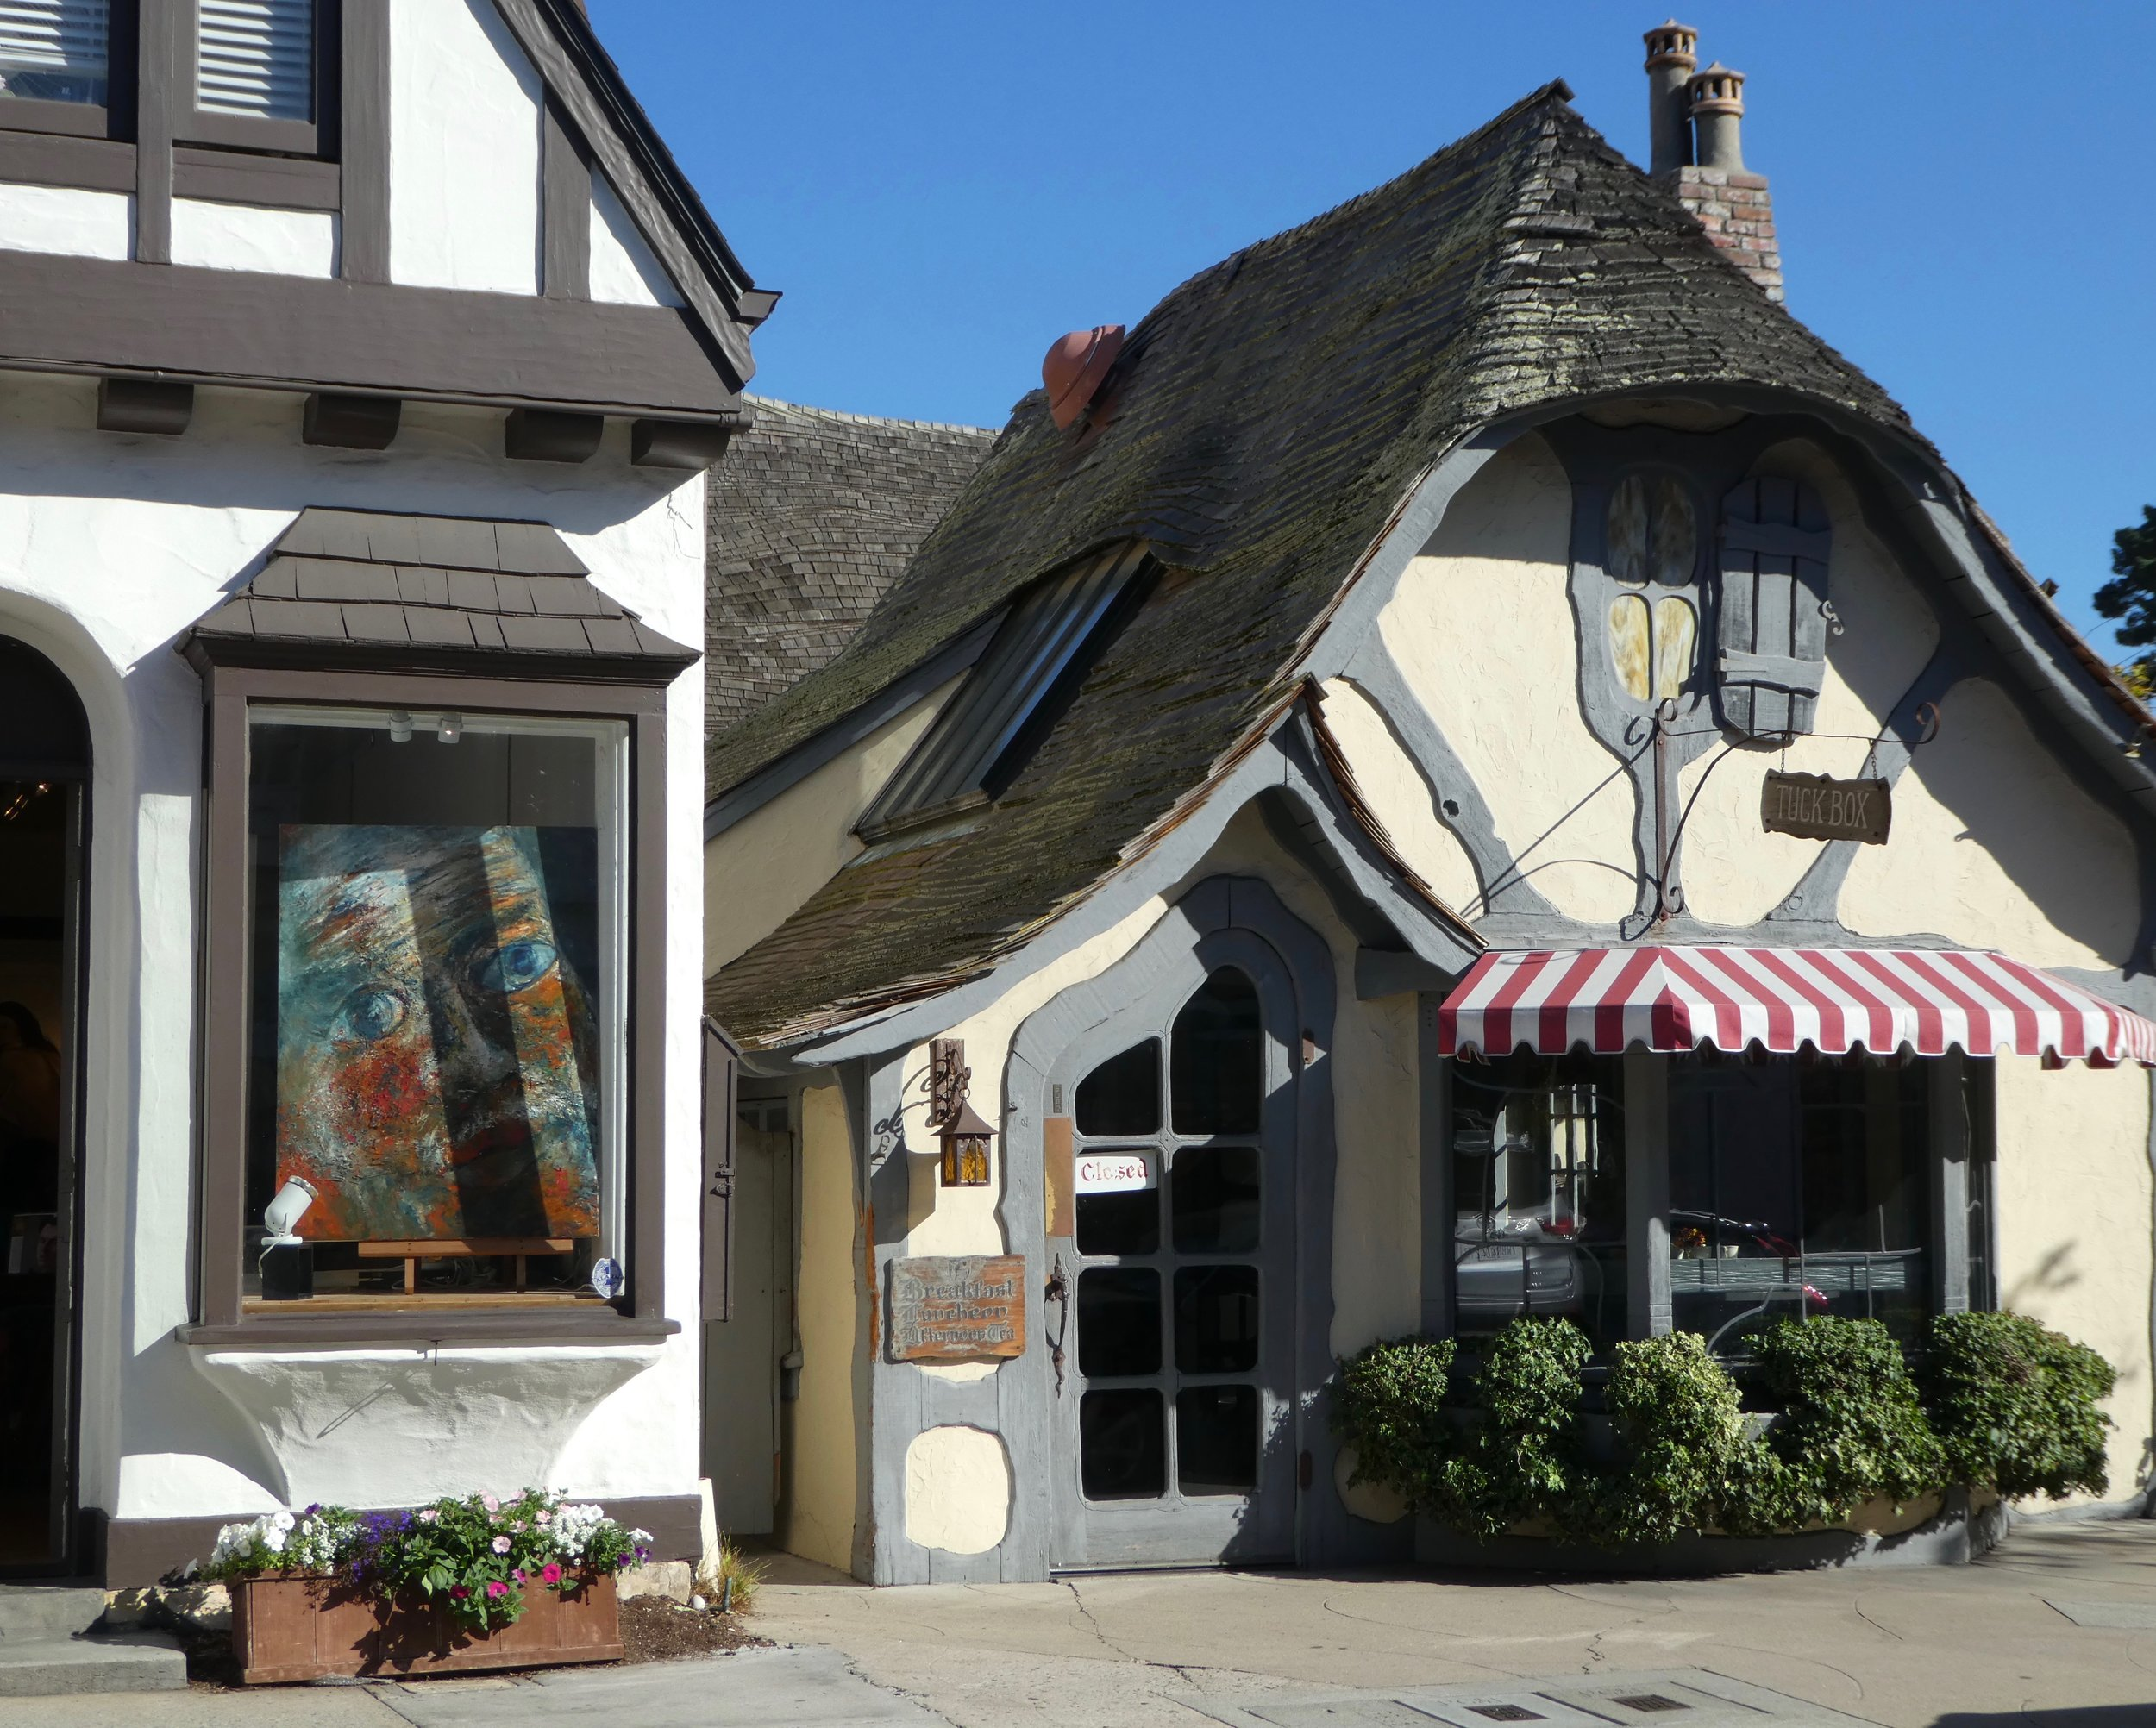 art-architecture-carmel-california.jpg